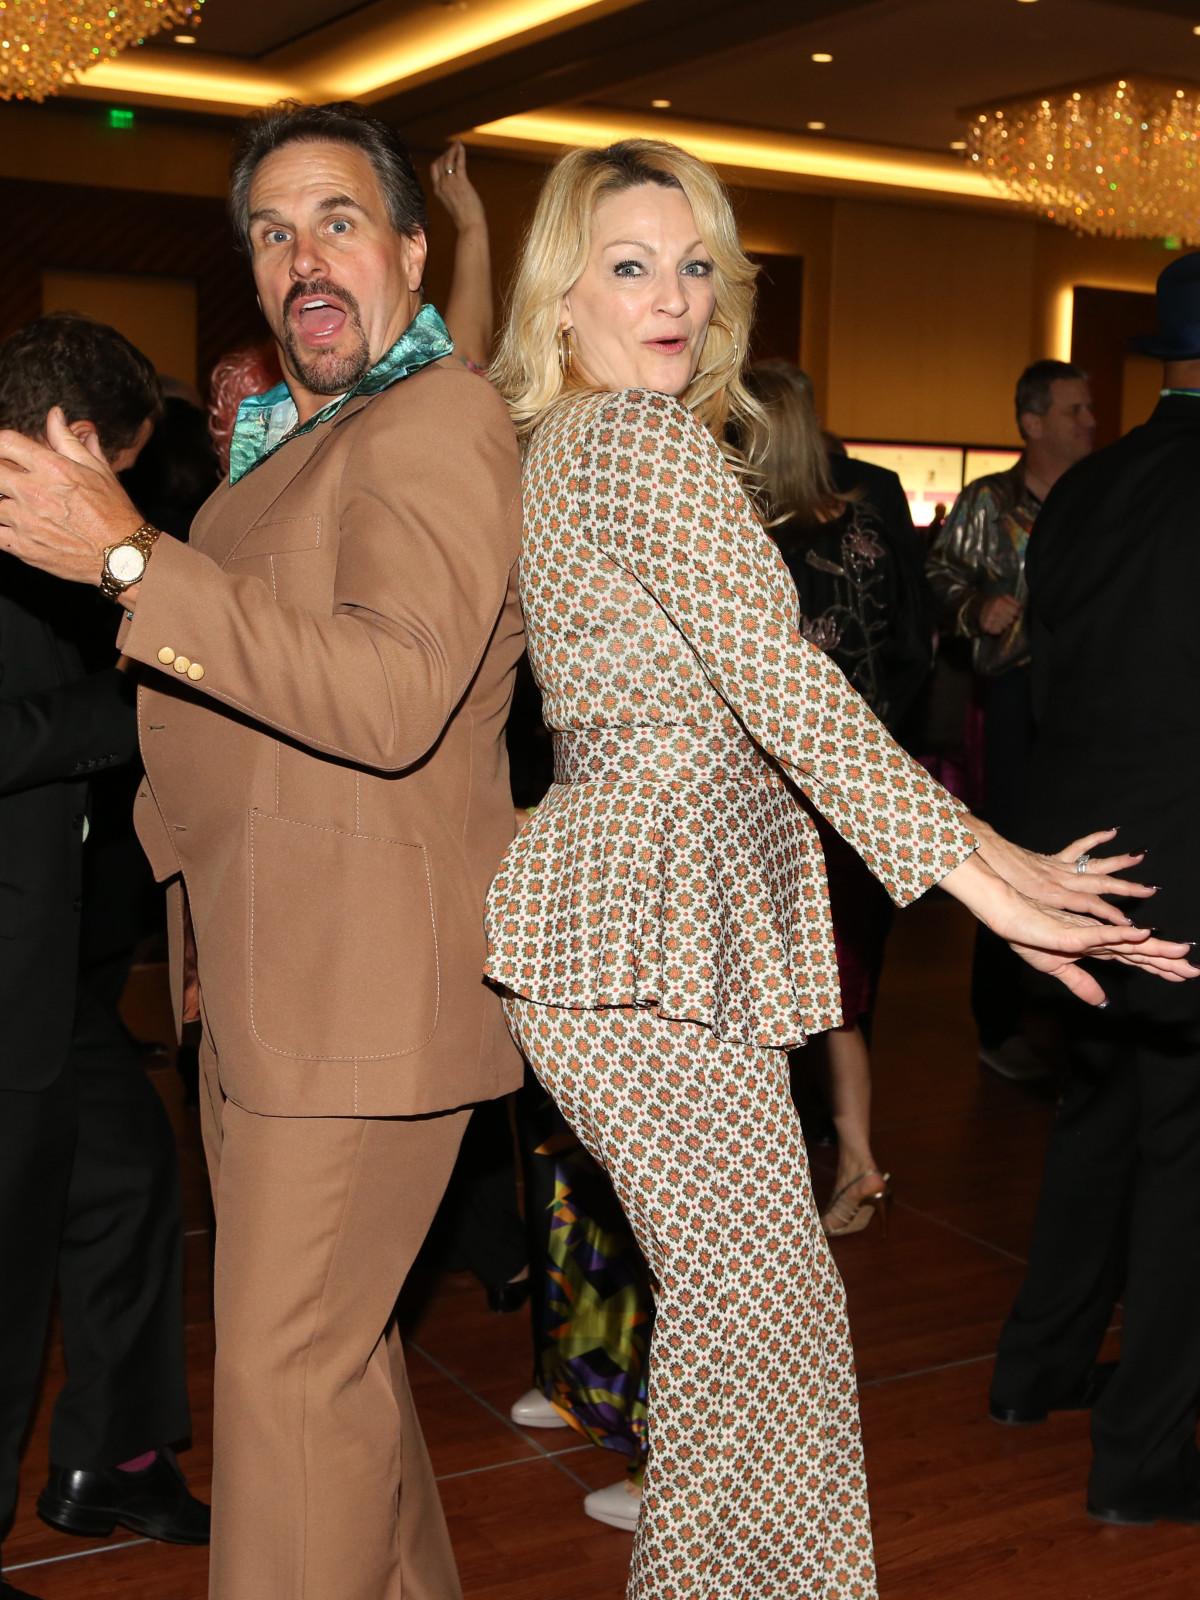 Duke and C.C. Ensell at Houston Area Women's Center Gala